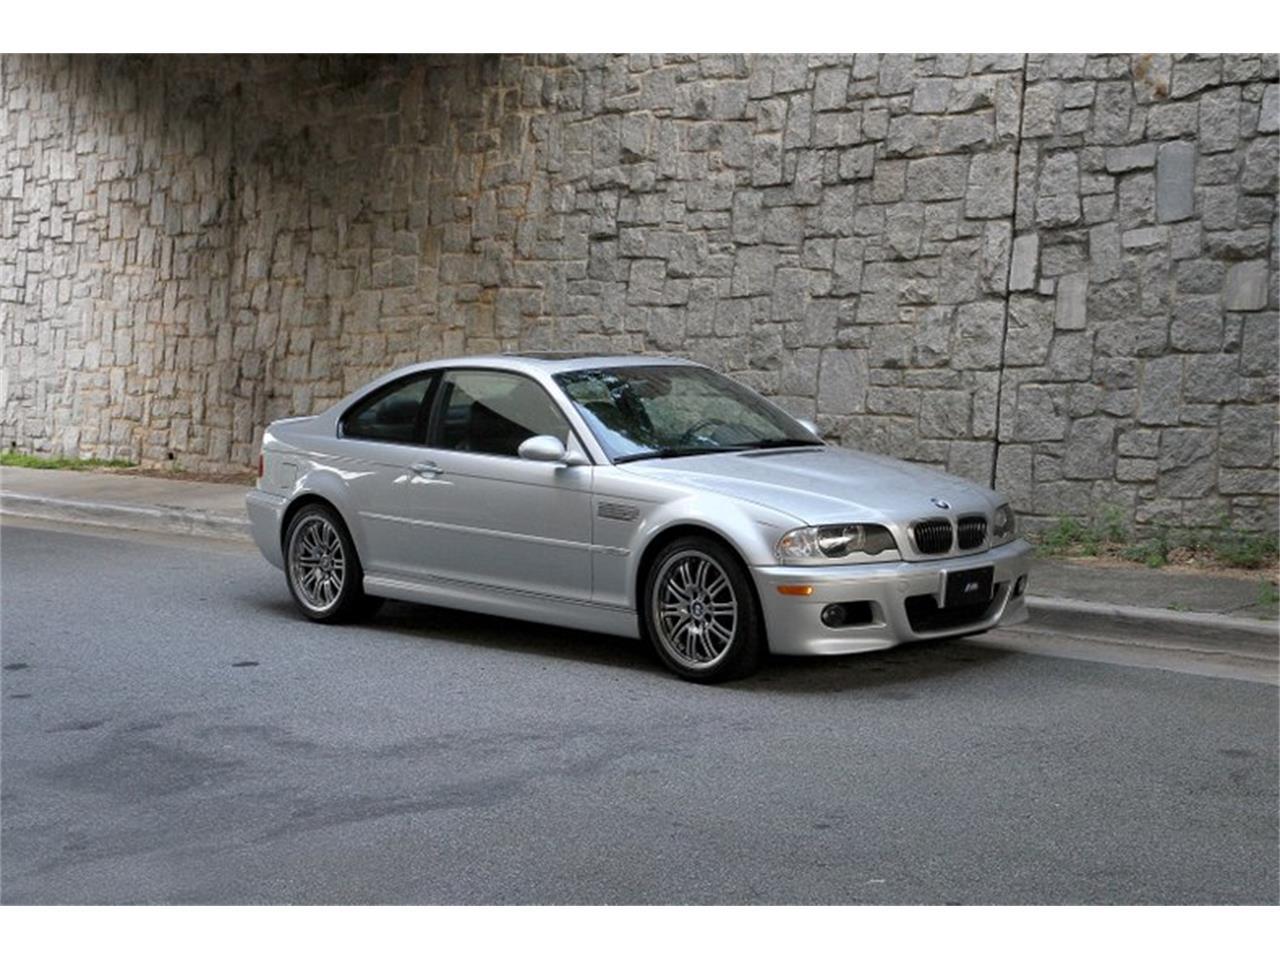 2002 bmw m3 for sale   classiccars   cc-1155285